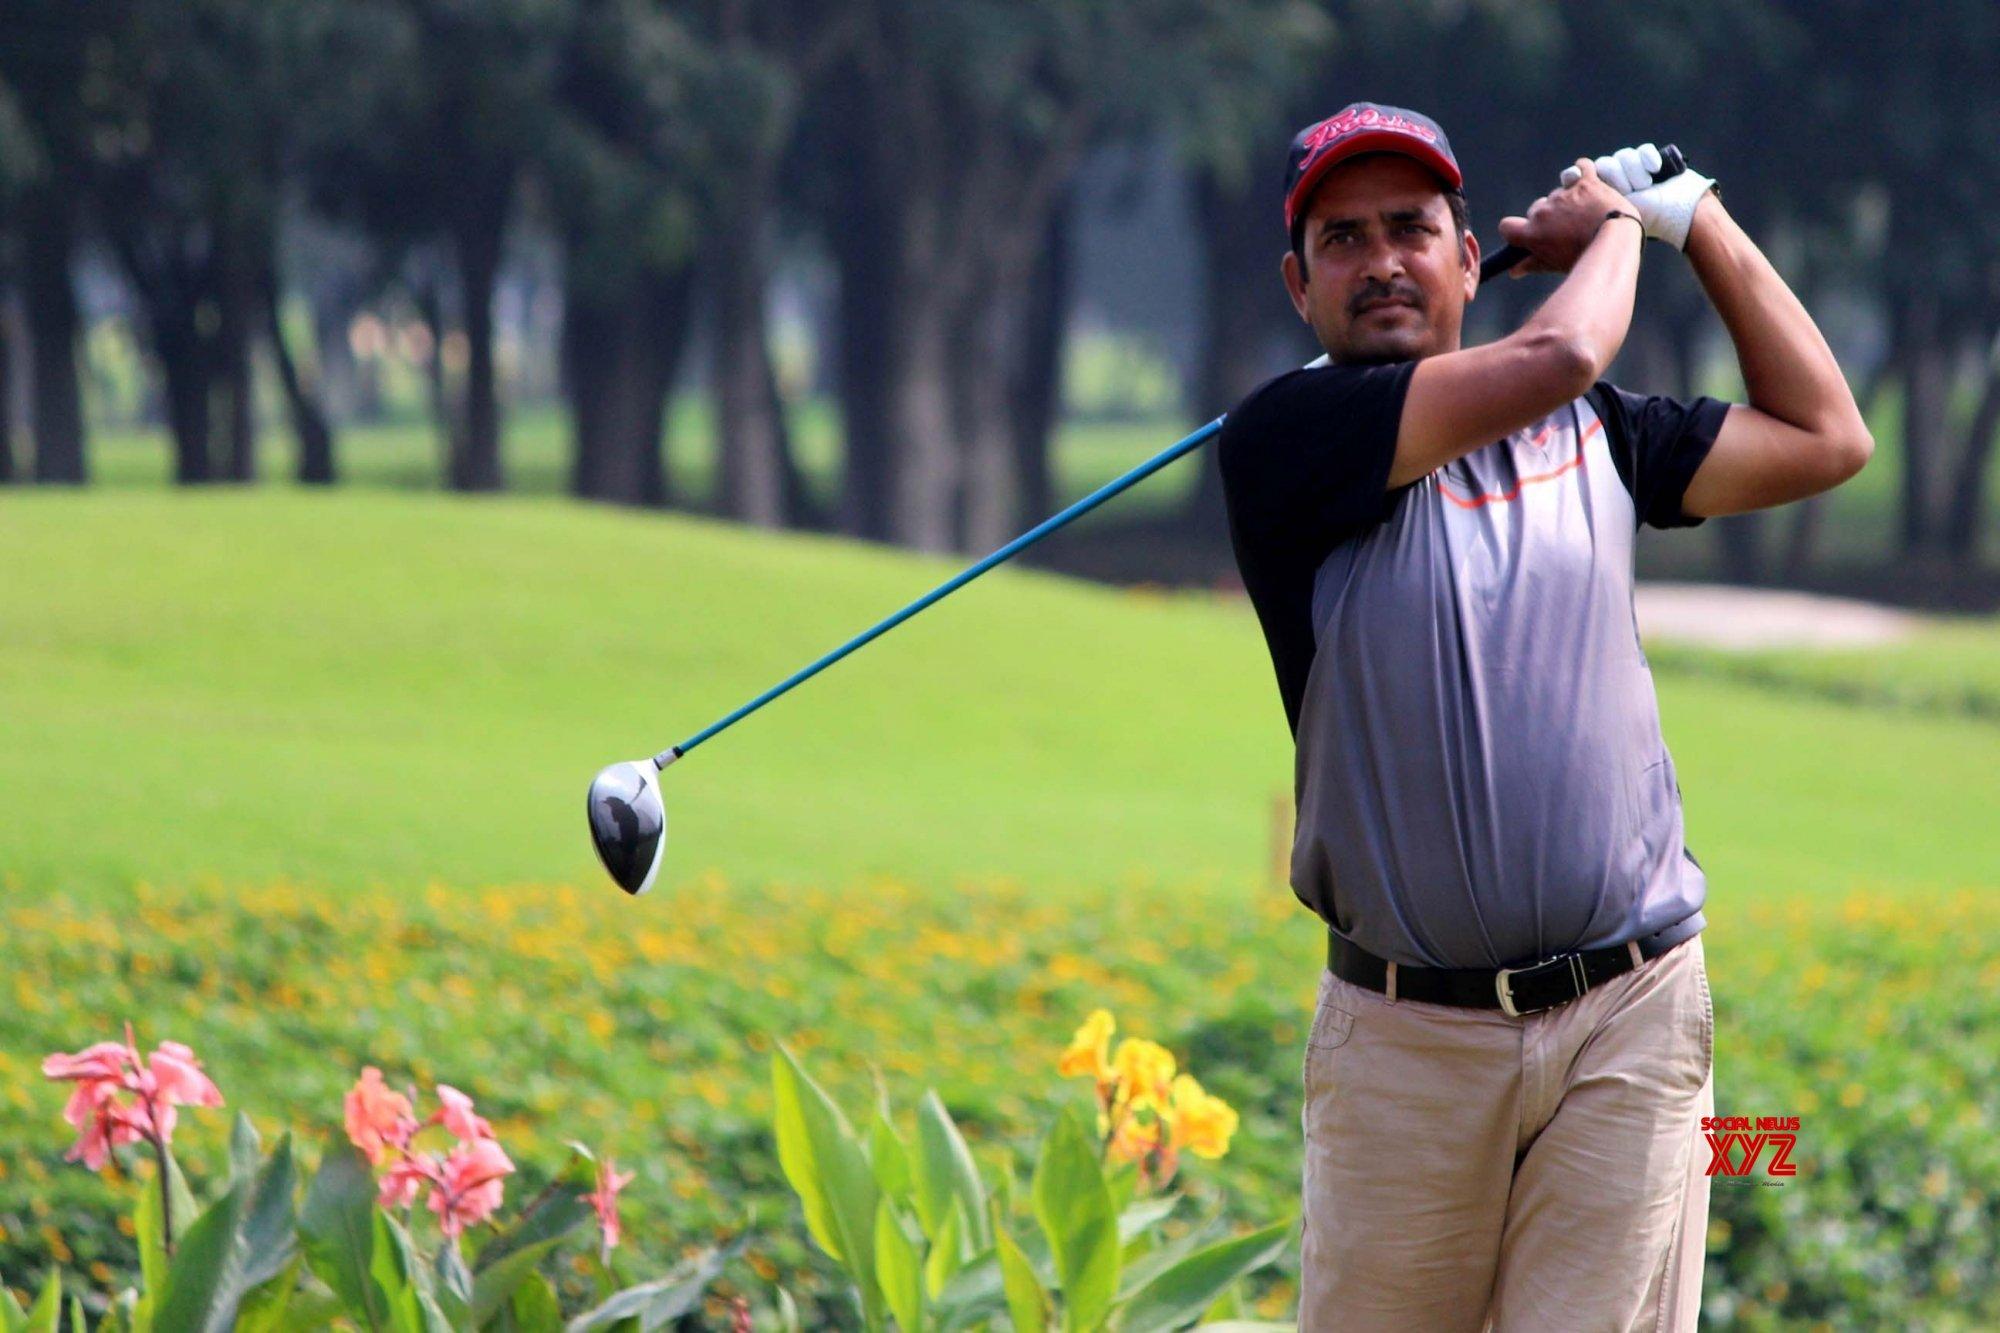 Shamim coasts to three-shot win at Kensville Open